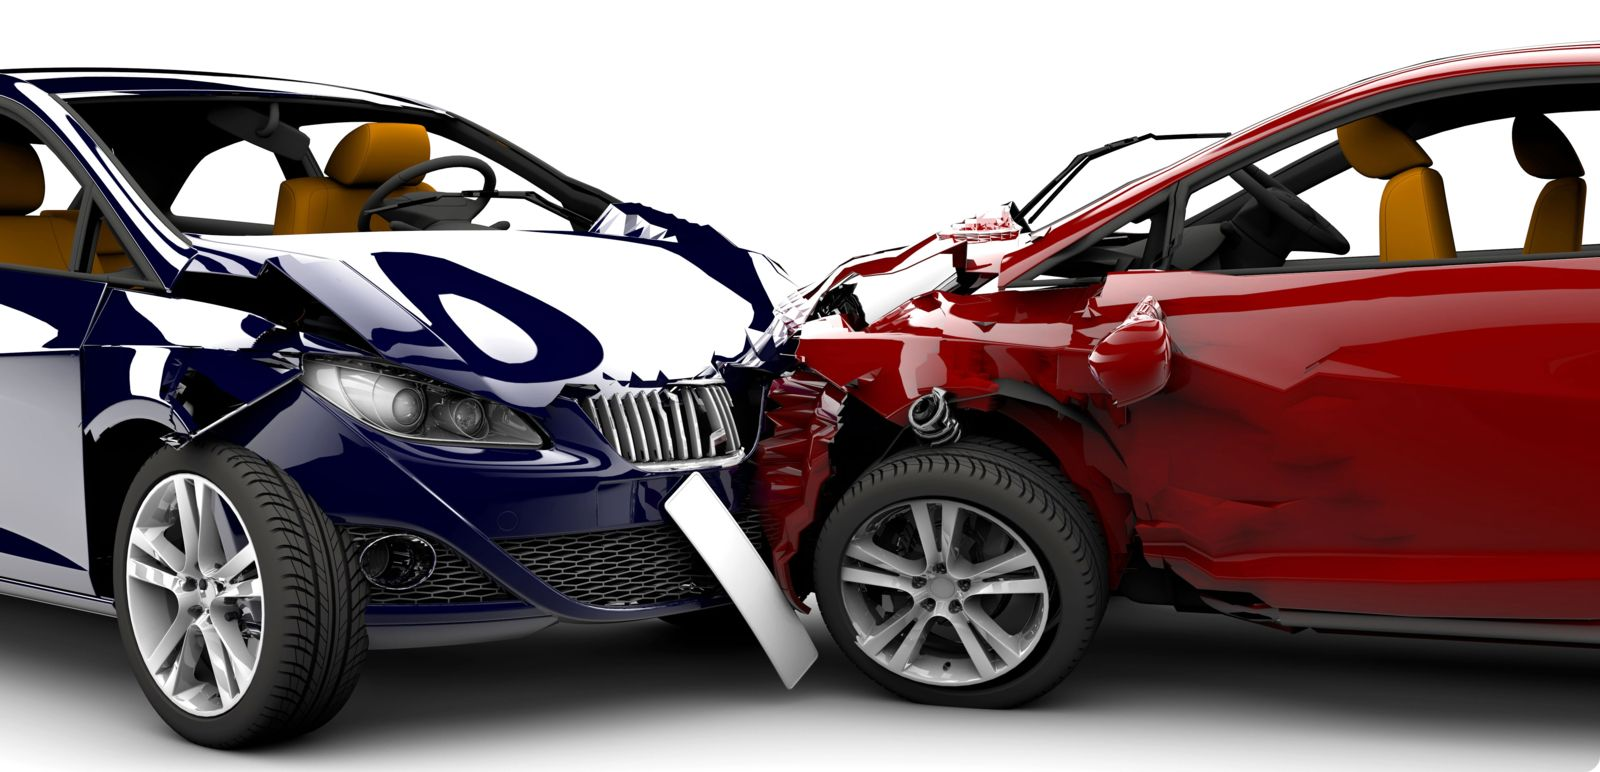 mcallen texas car accident attorney law office of raul a guajardo